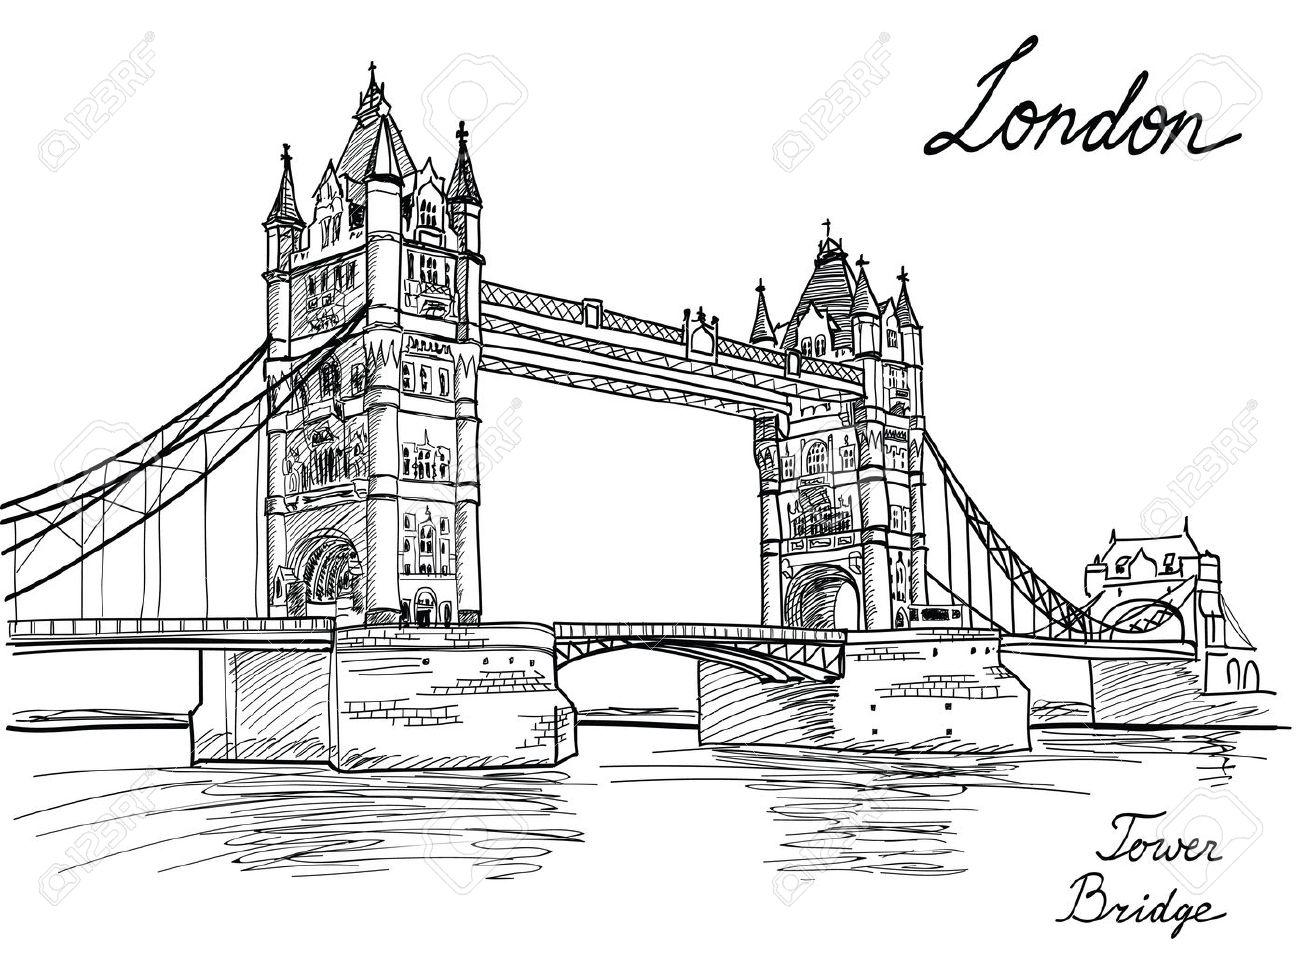 Tower Bridge London England Uk Hand Drawn Illustration Royalty